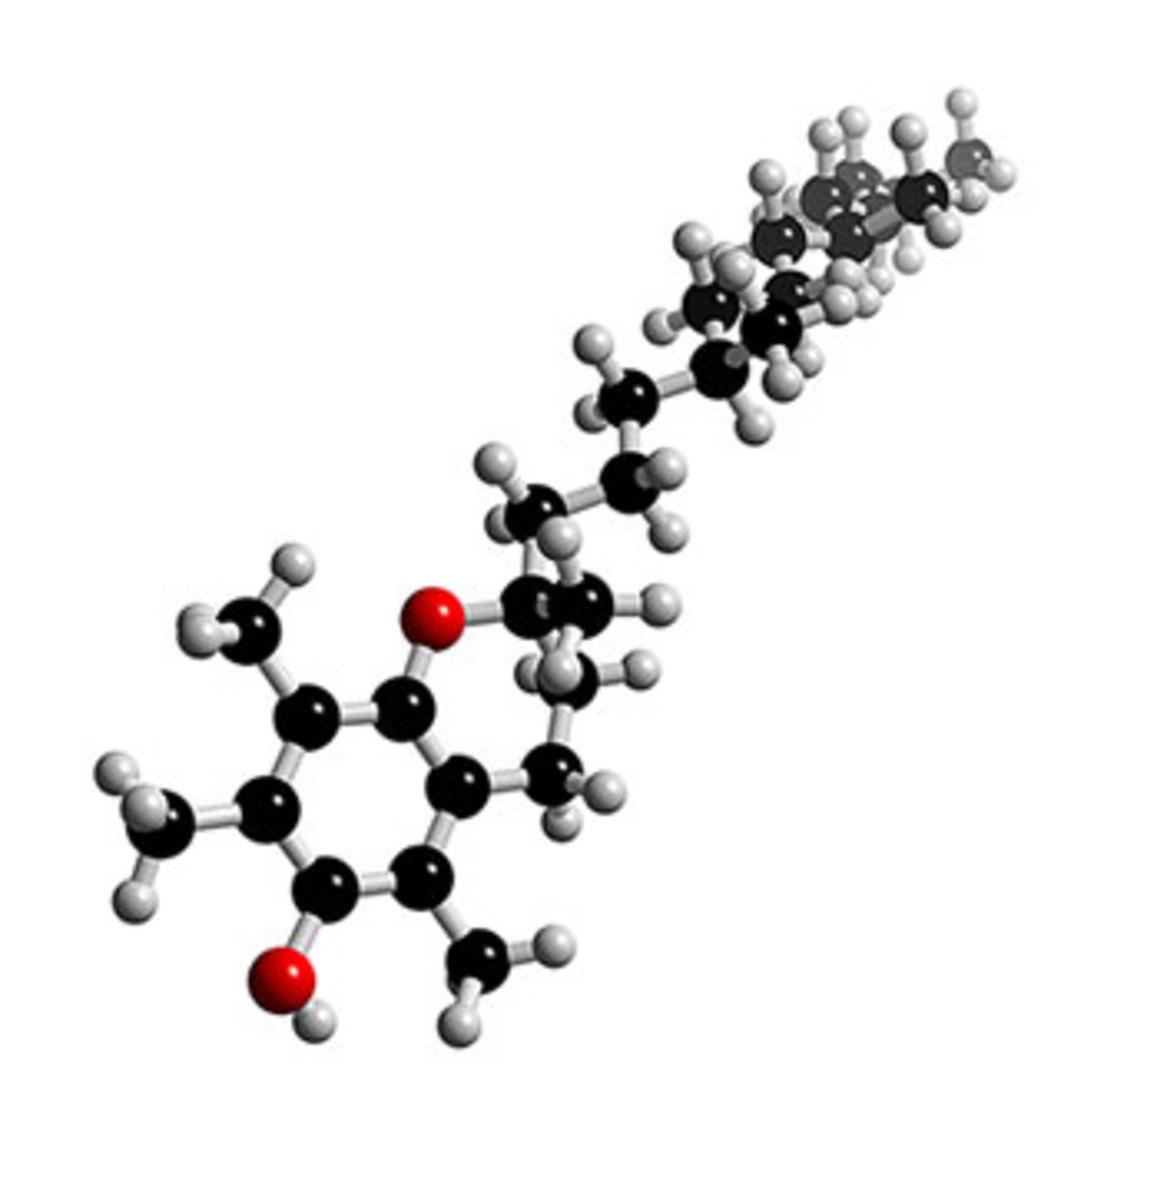 3-D Model of Vitamin E